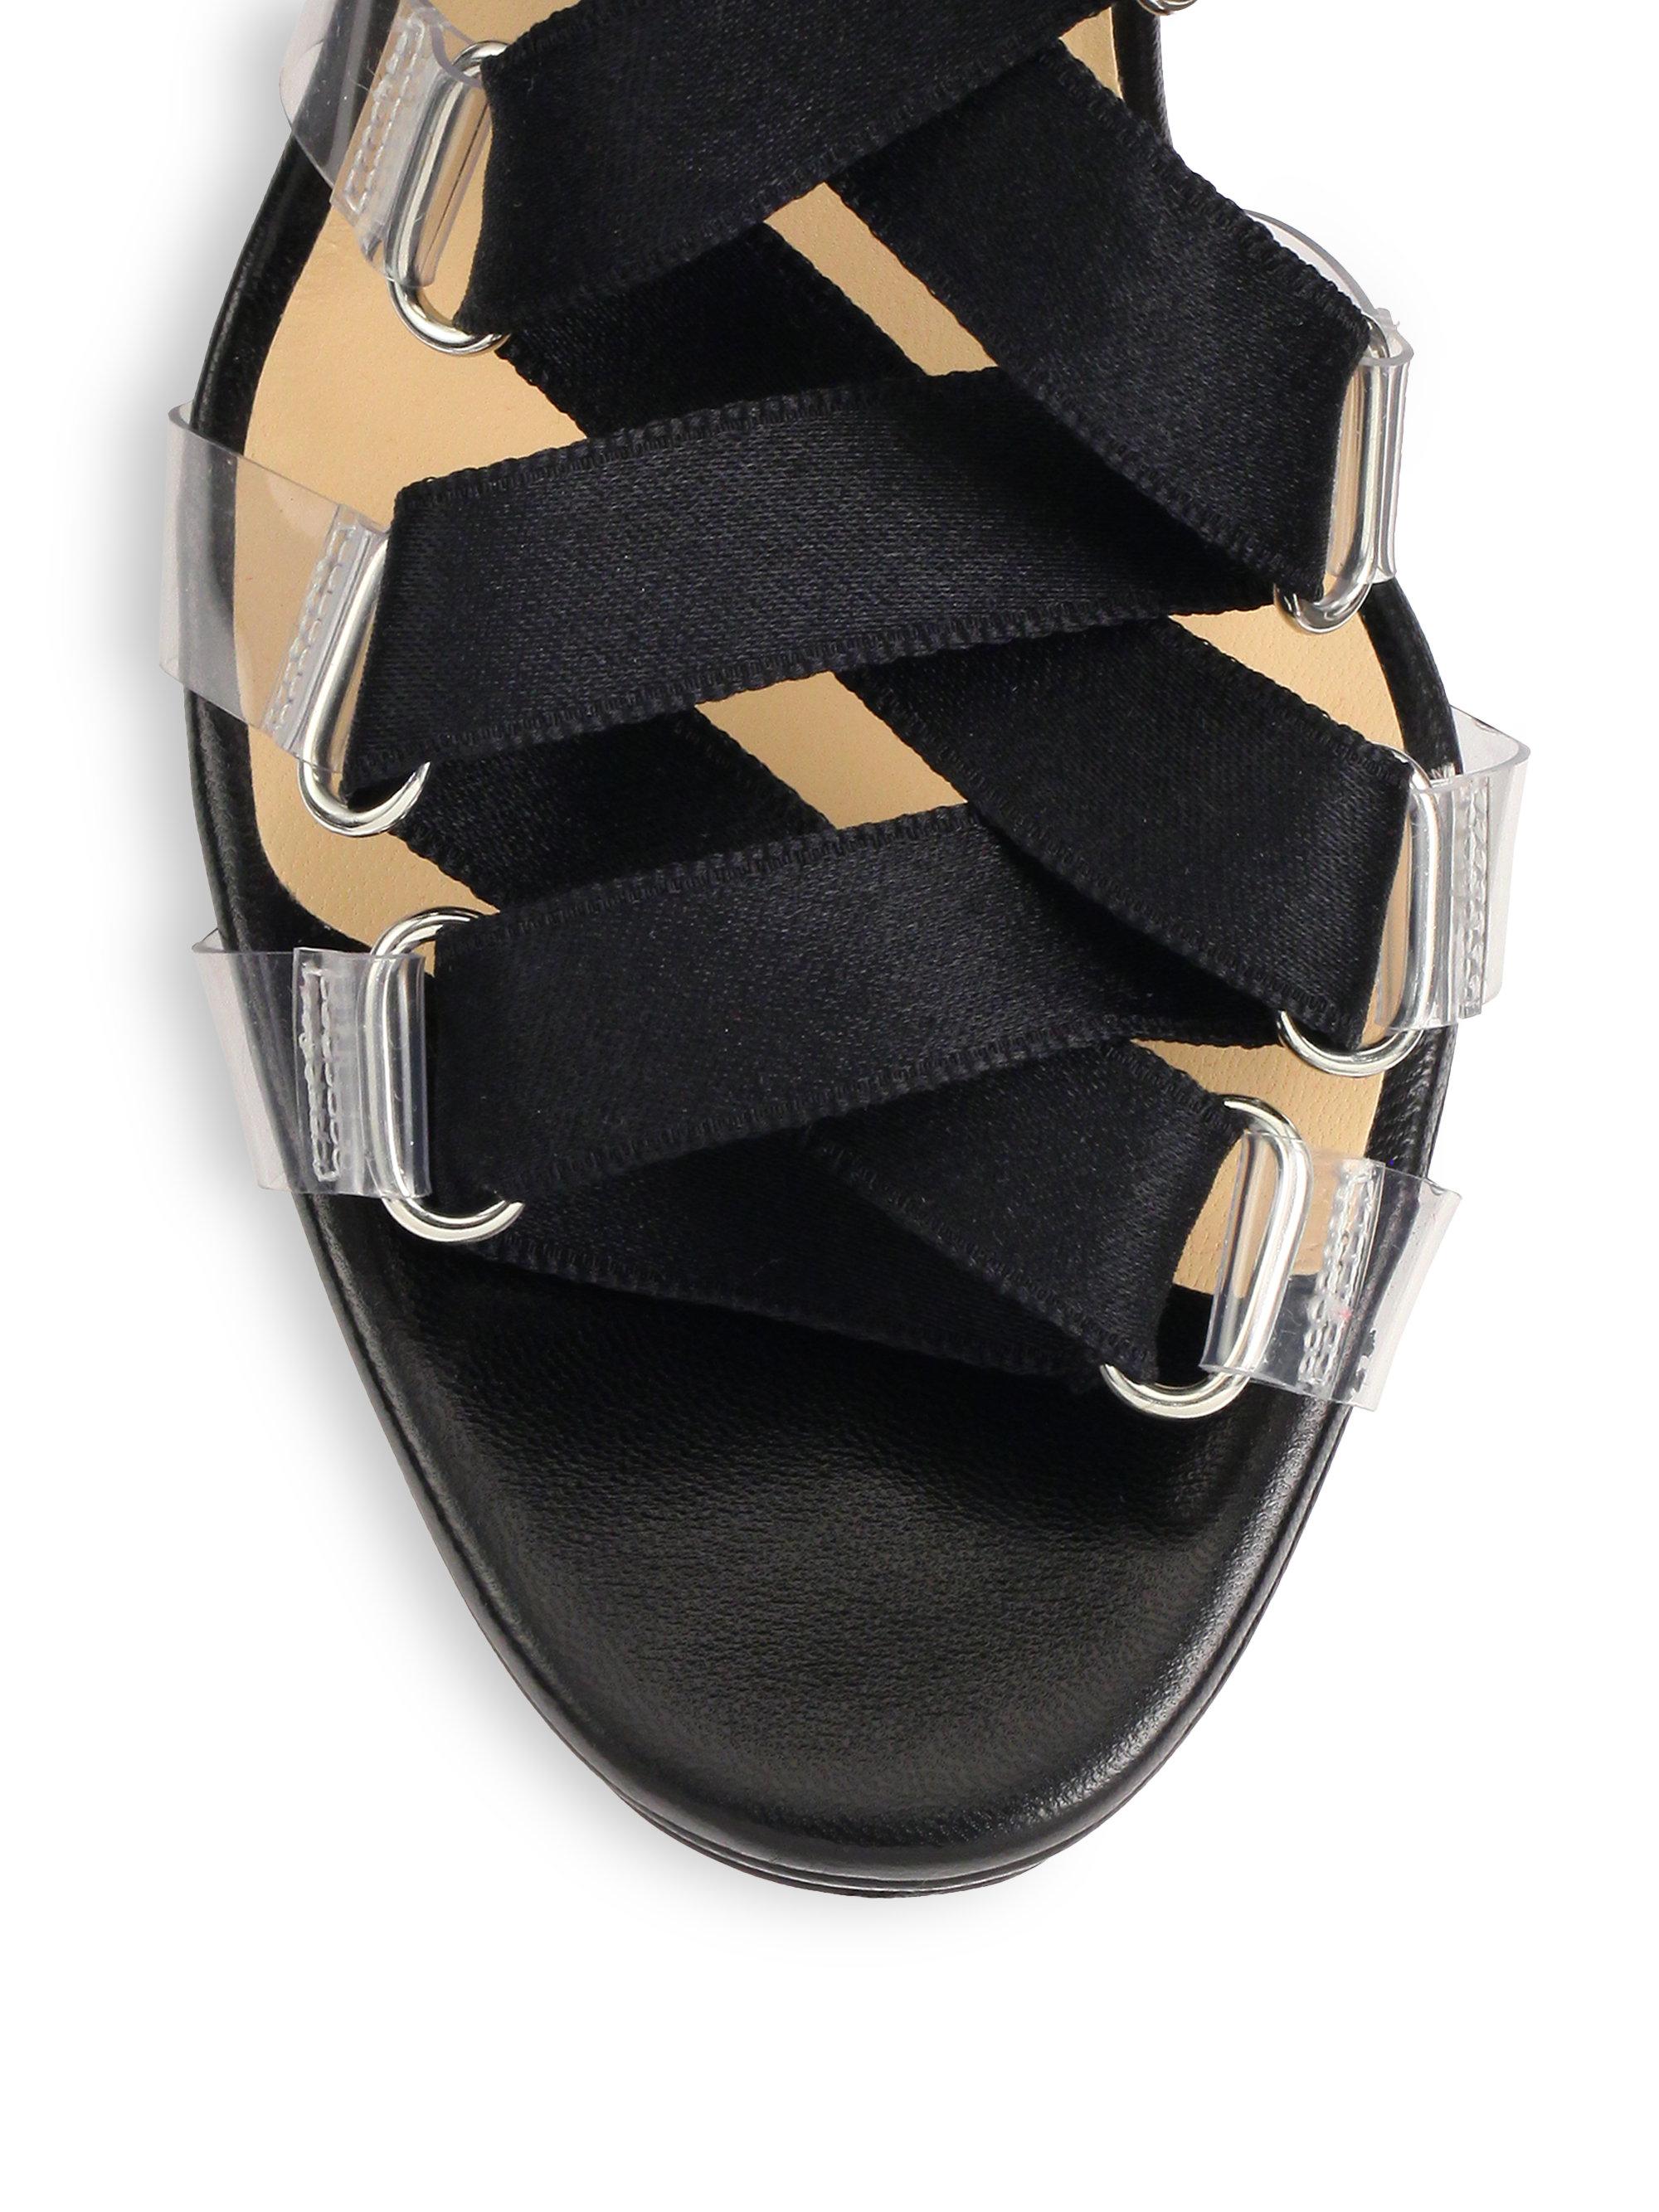 2ef8daf4229 Christian Louboutin Black Nymphette Satin Tieup Sandals